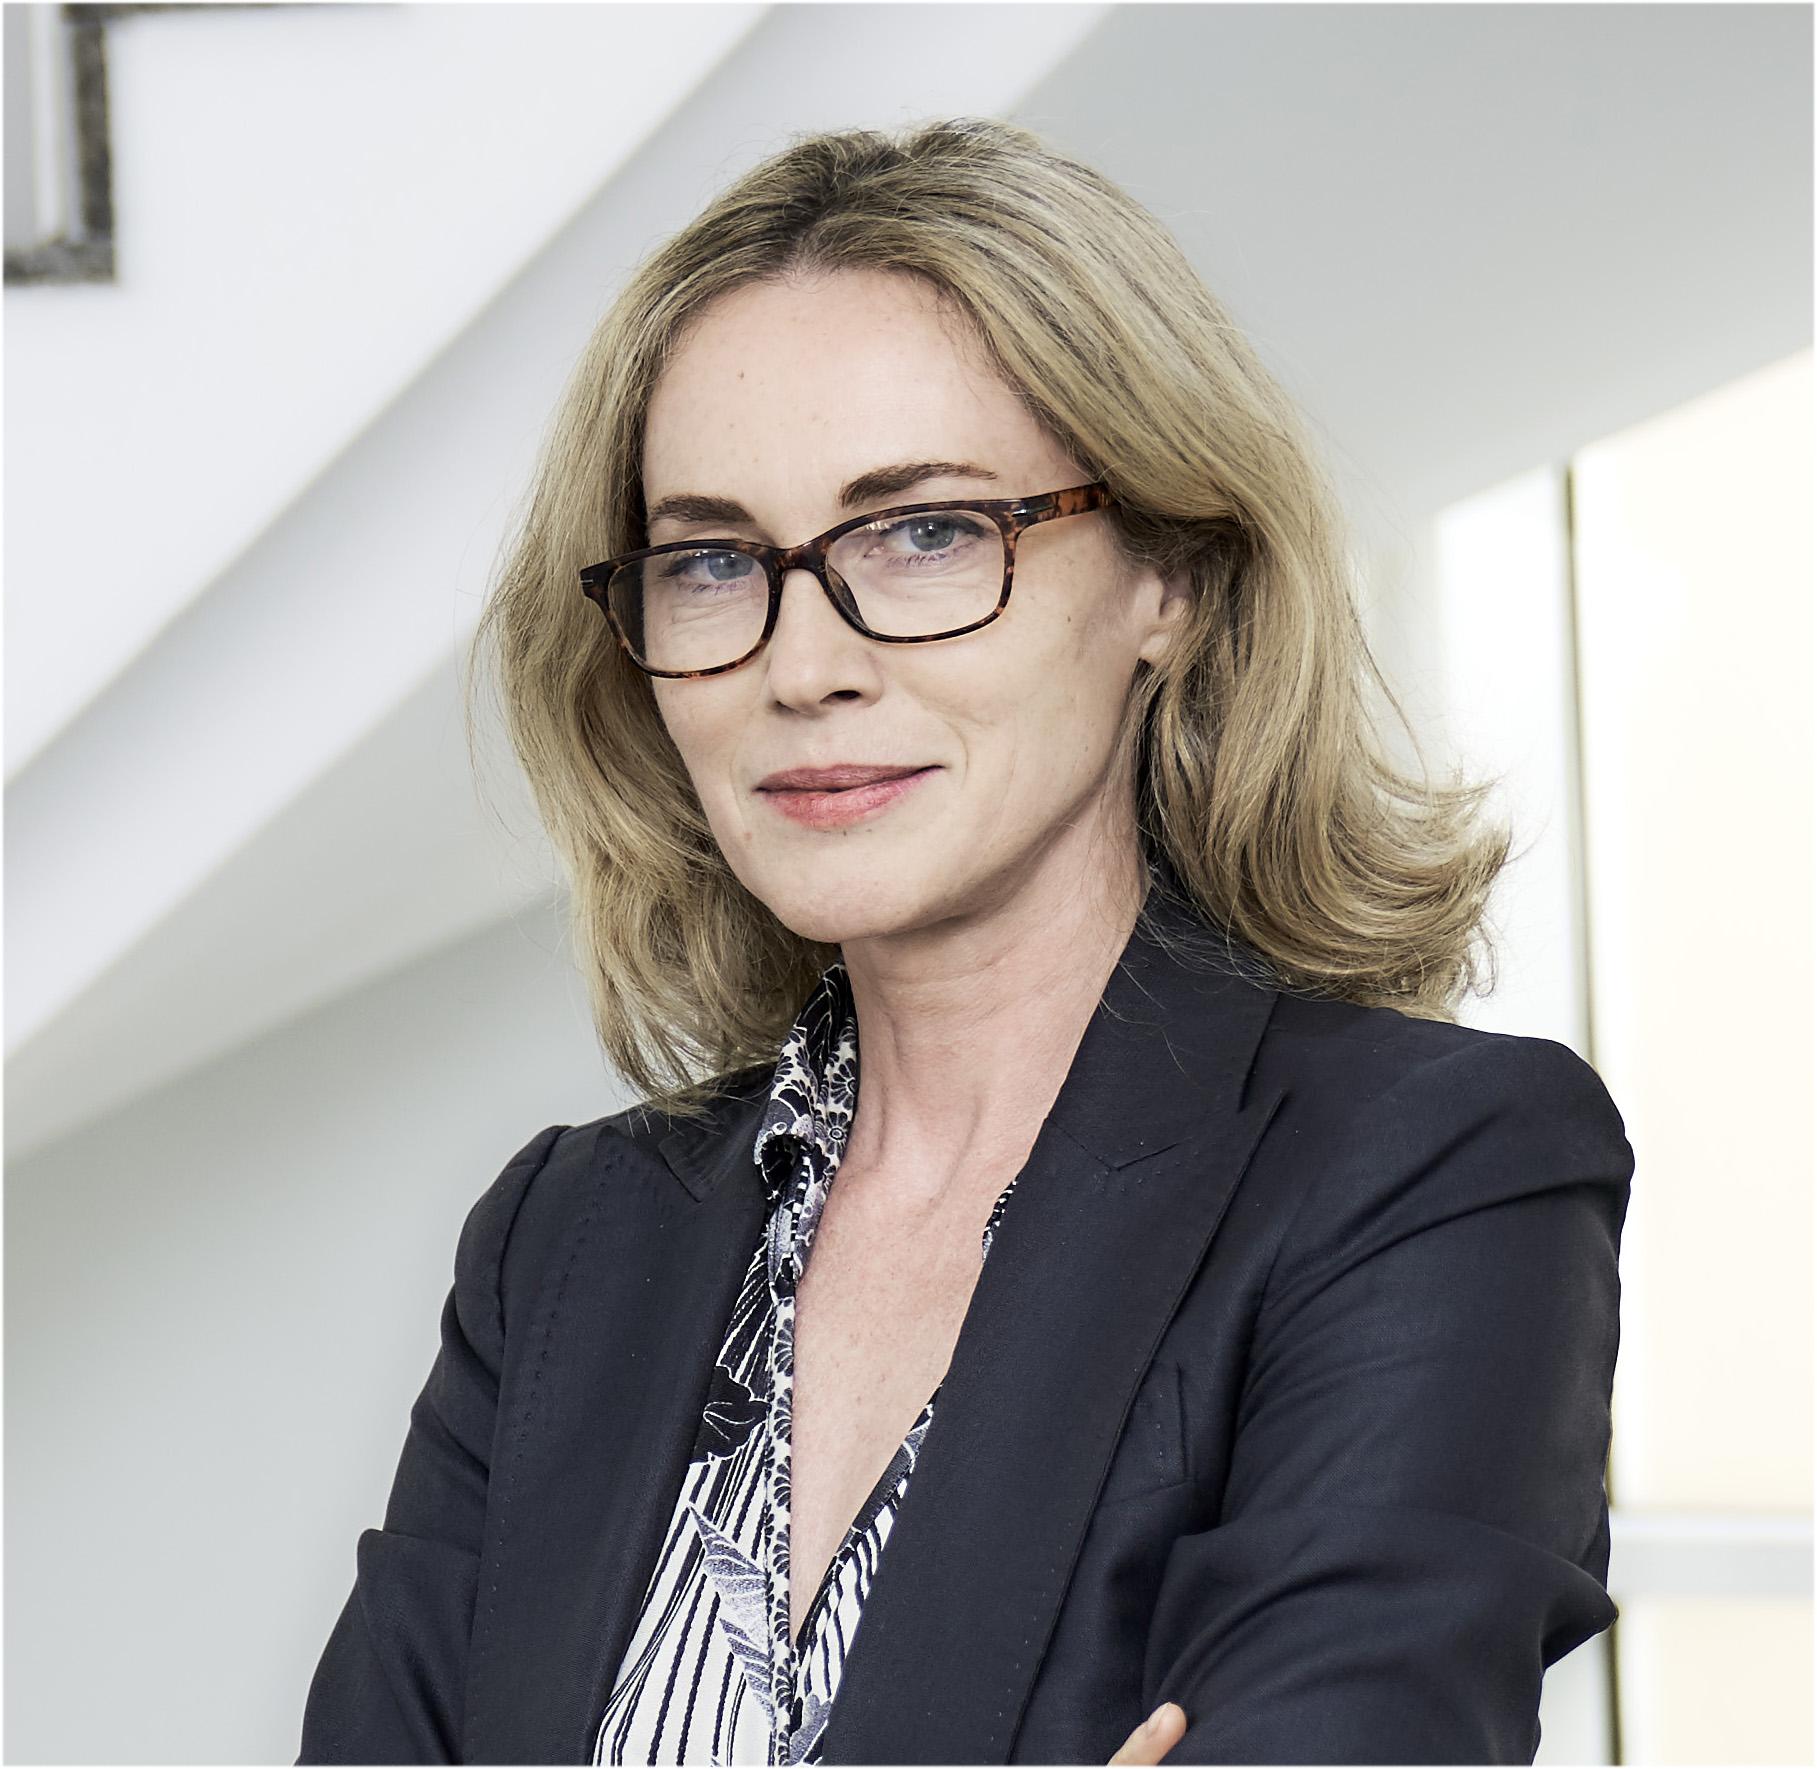 Prof. Franziska Nori, Direktorin Frankfurter Kunstverein